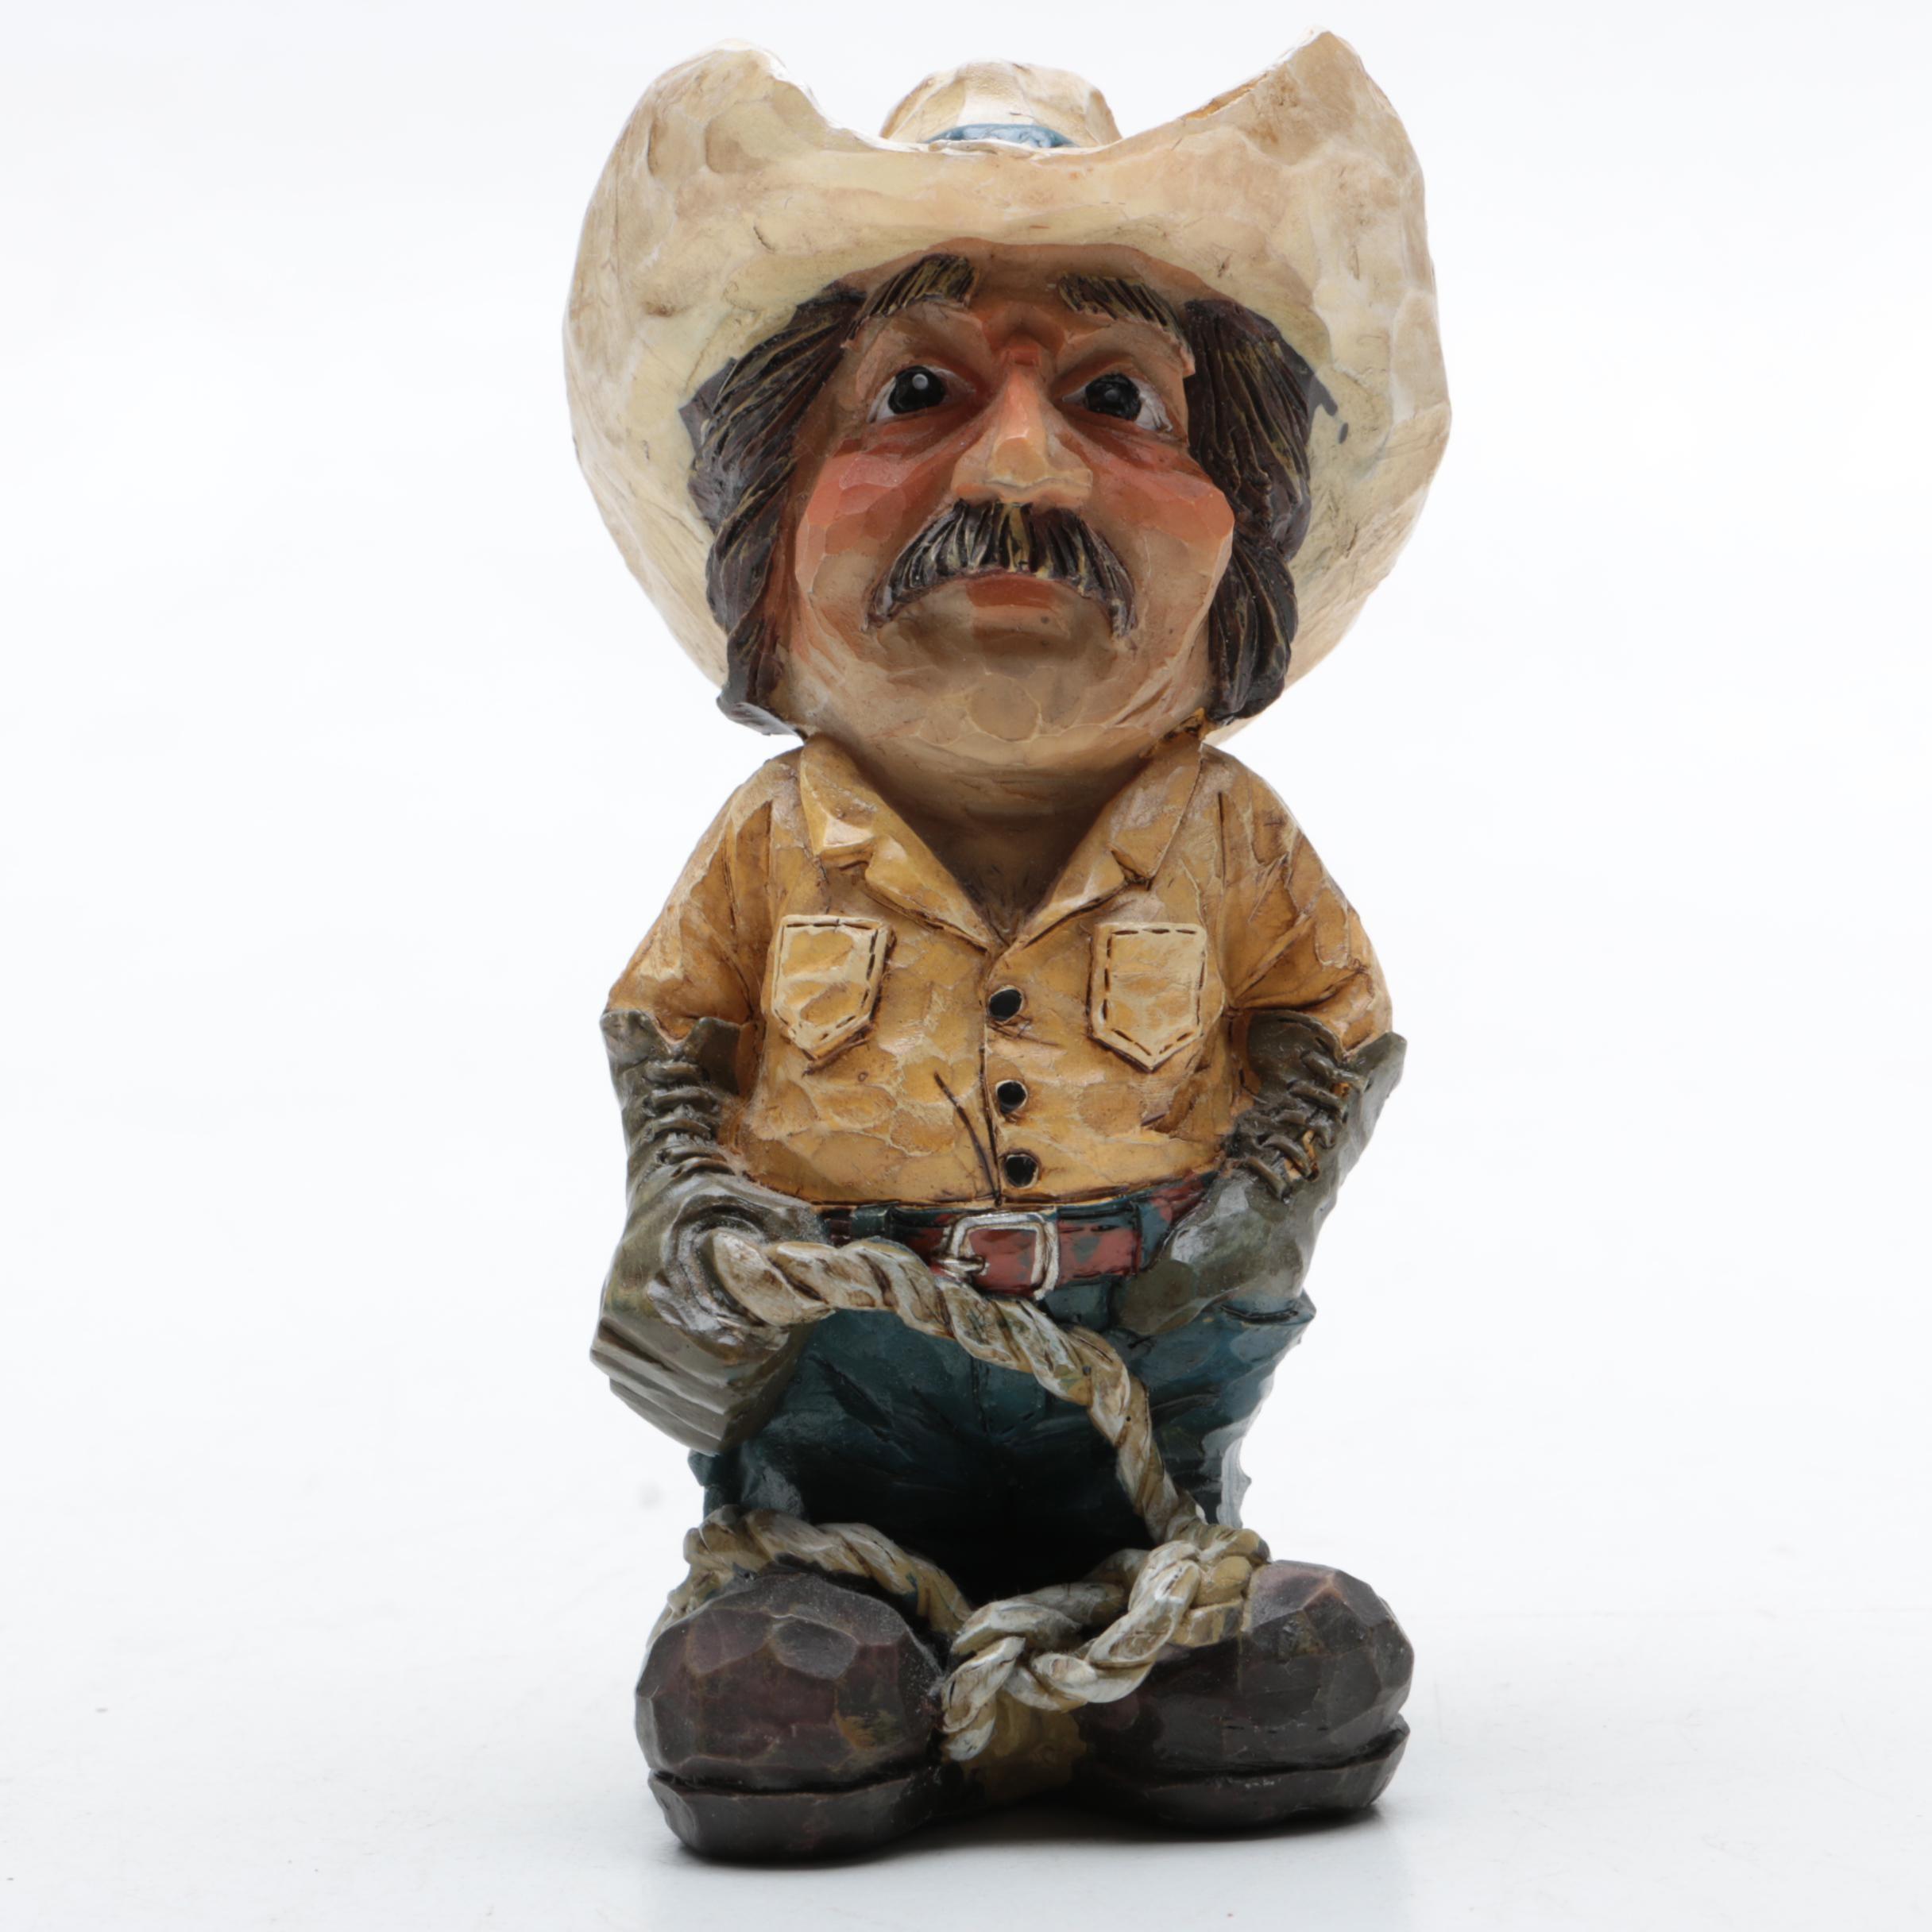 Carved Wood Cowboy Figurine